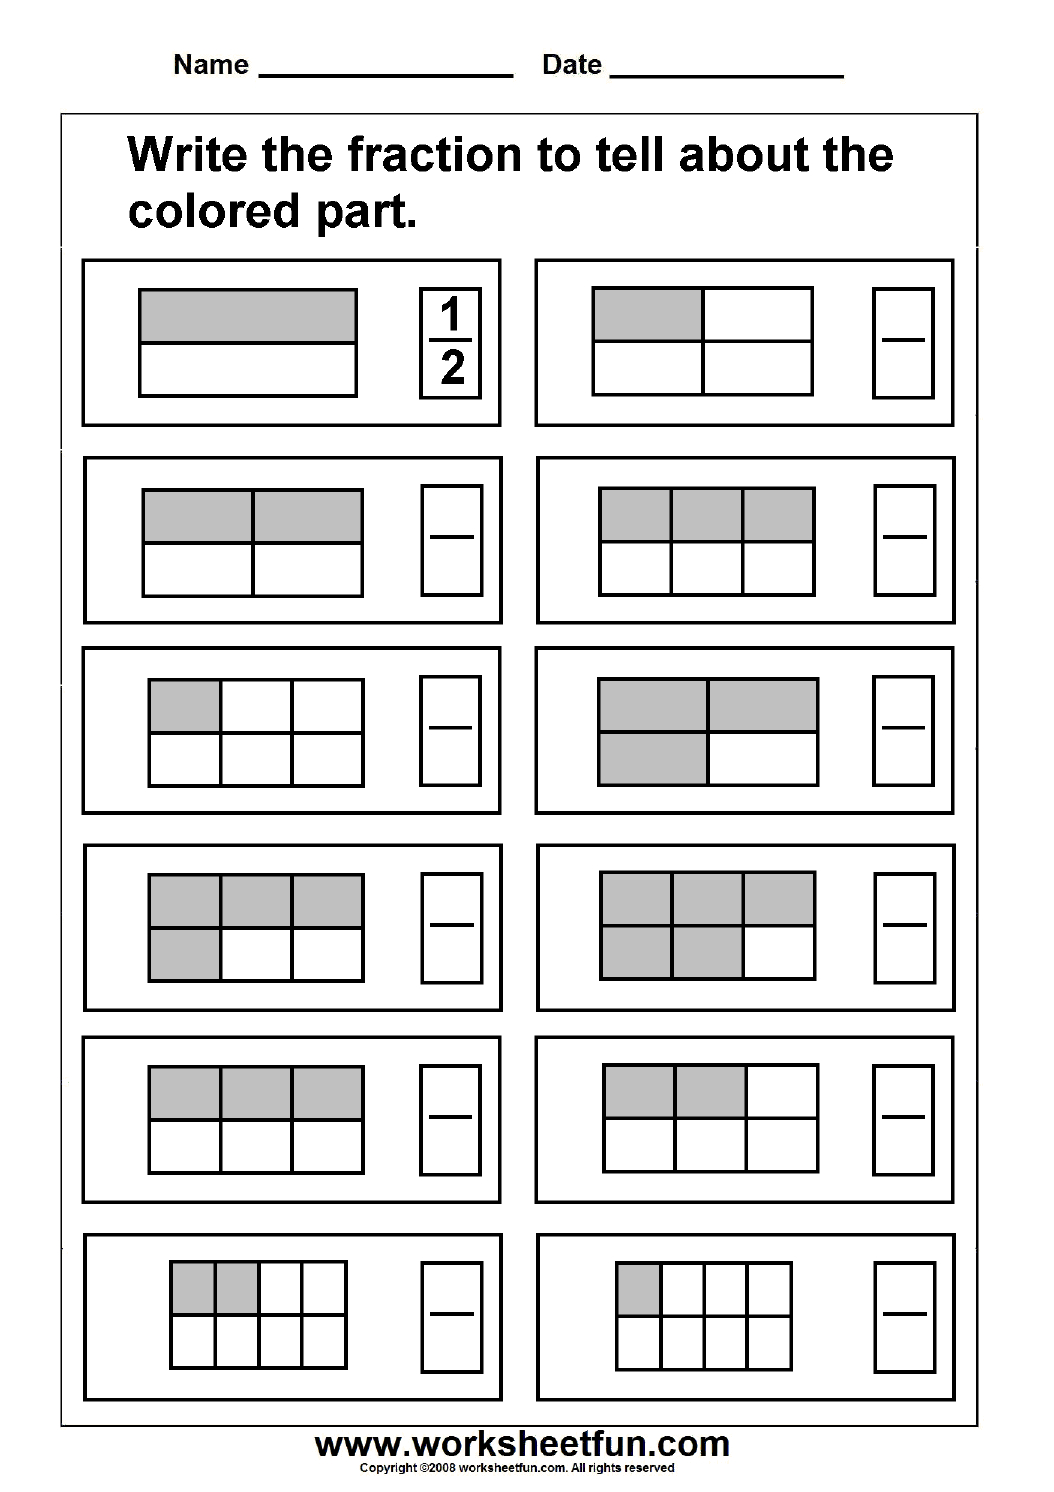 Fraction / Free Printable Worksheets – Worksheetfun - Free Printable First Grade Fraction Worksheets